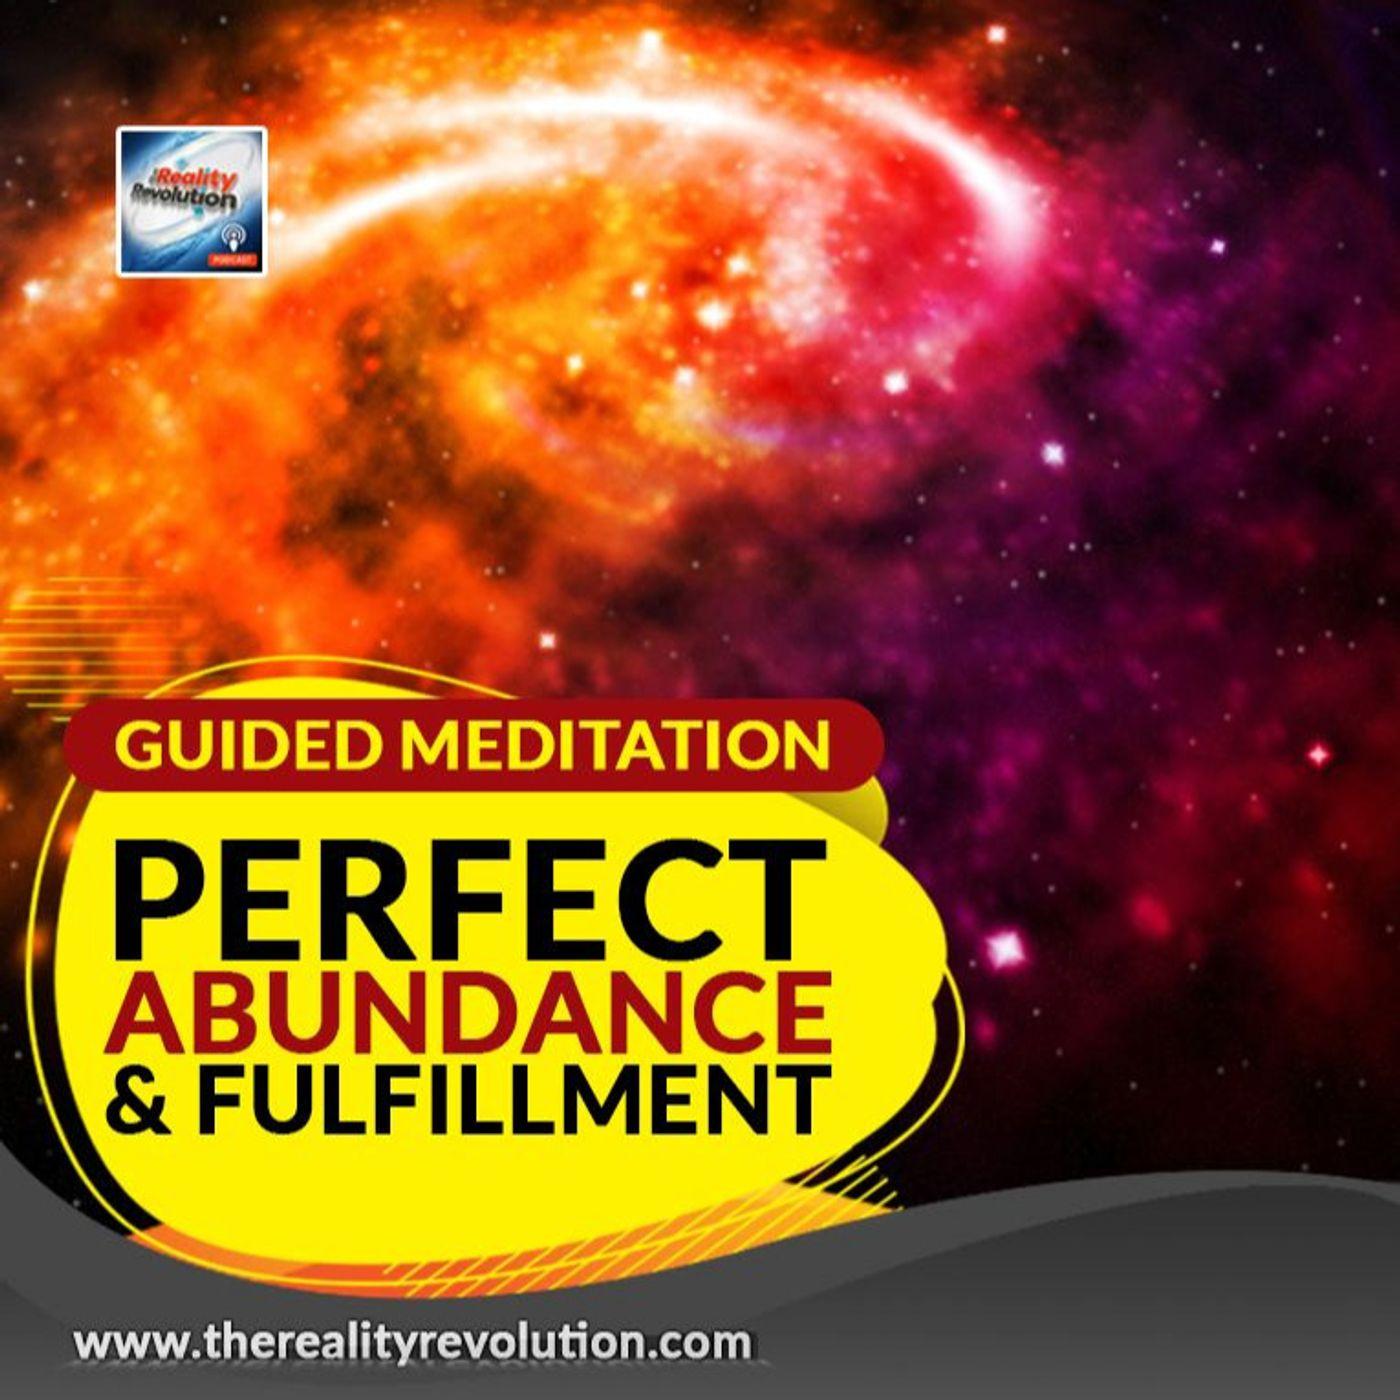 Guided Meditation Perfect Abundance And Fulfillment